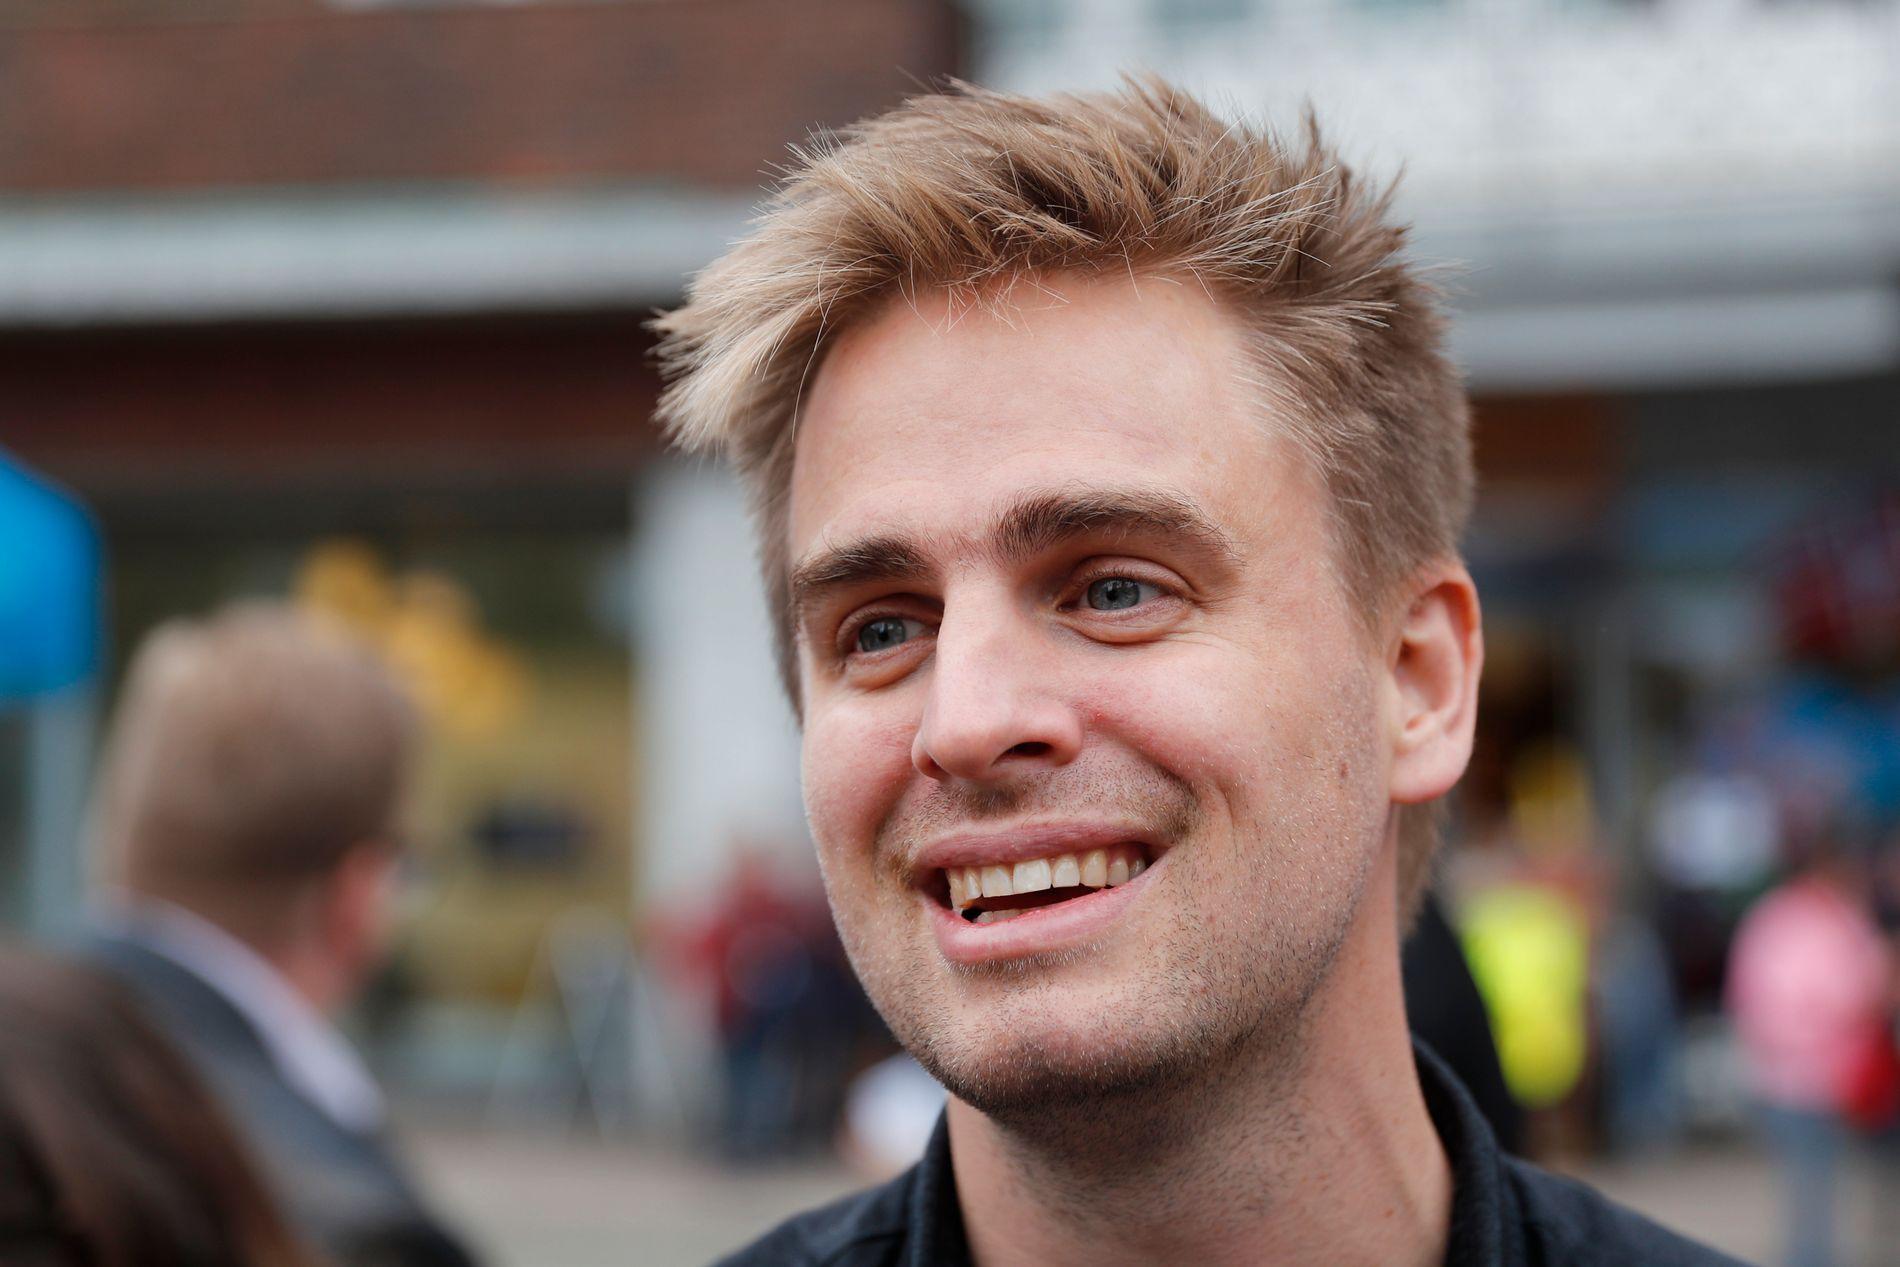 VIL KLAGE: Eivind Trædal i Miljøpartiet de grønne sier at han vil klage saken inn til Domeneklagenemnda.